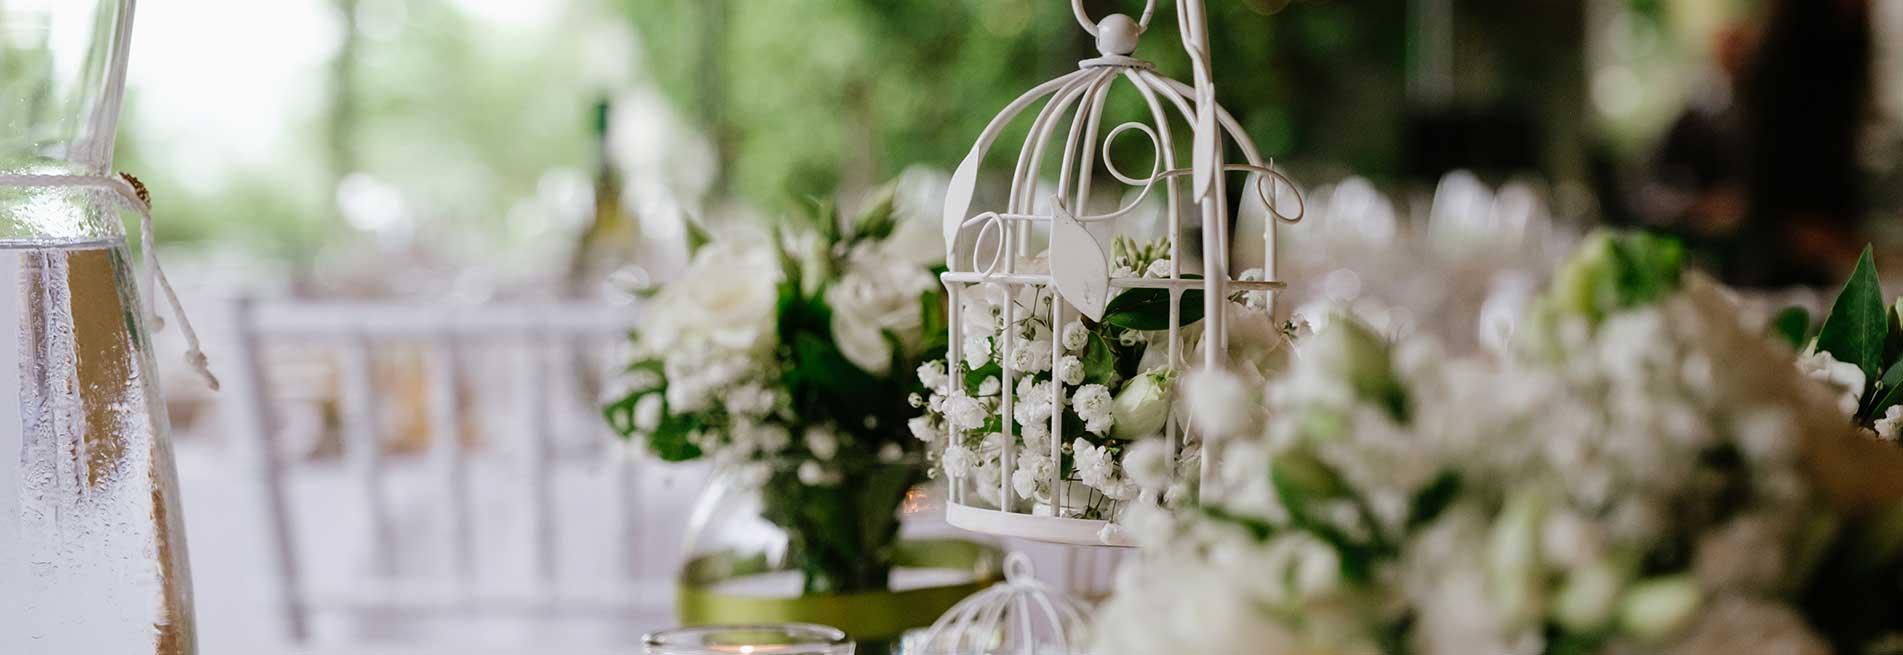 Notizie ed Eventi - Catering e banqueting Torino. Caterina per matrimoni, catering per cerimonie, banqueting e catering per eventi aziendali.